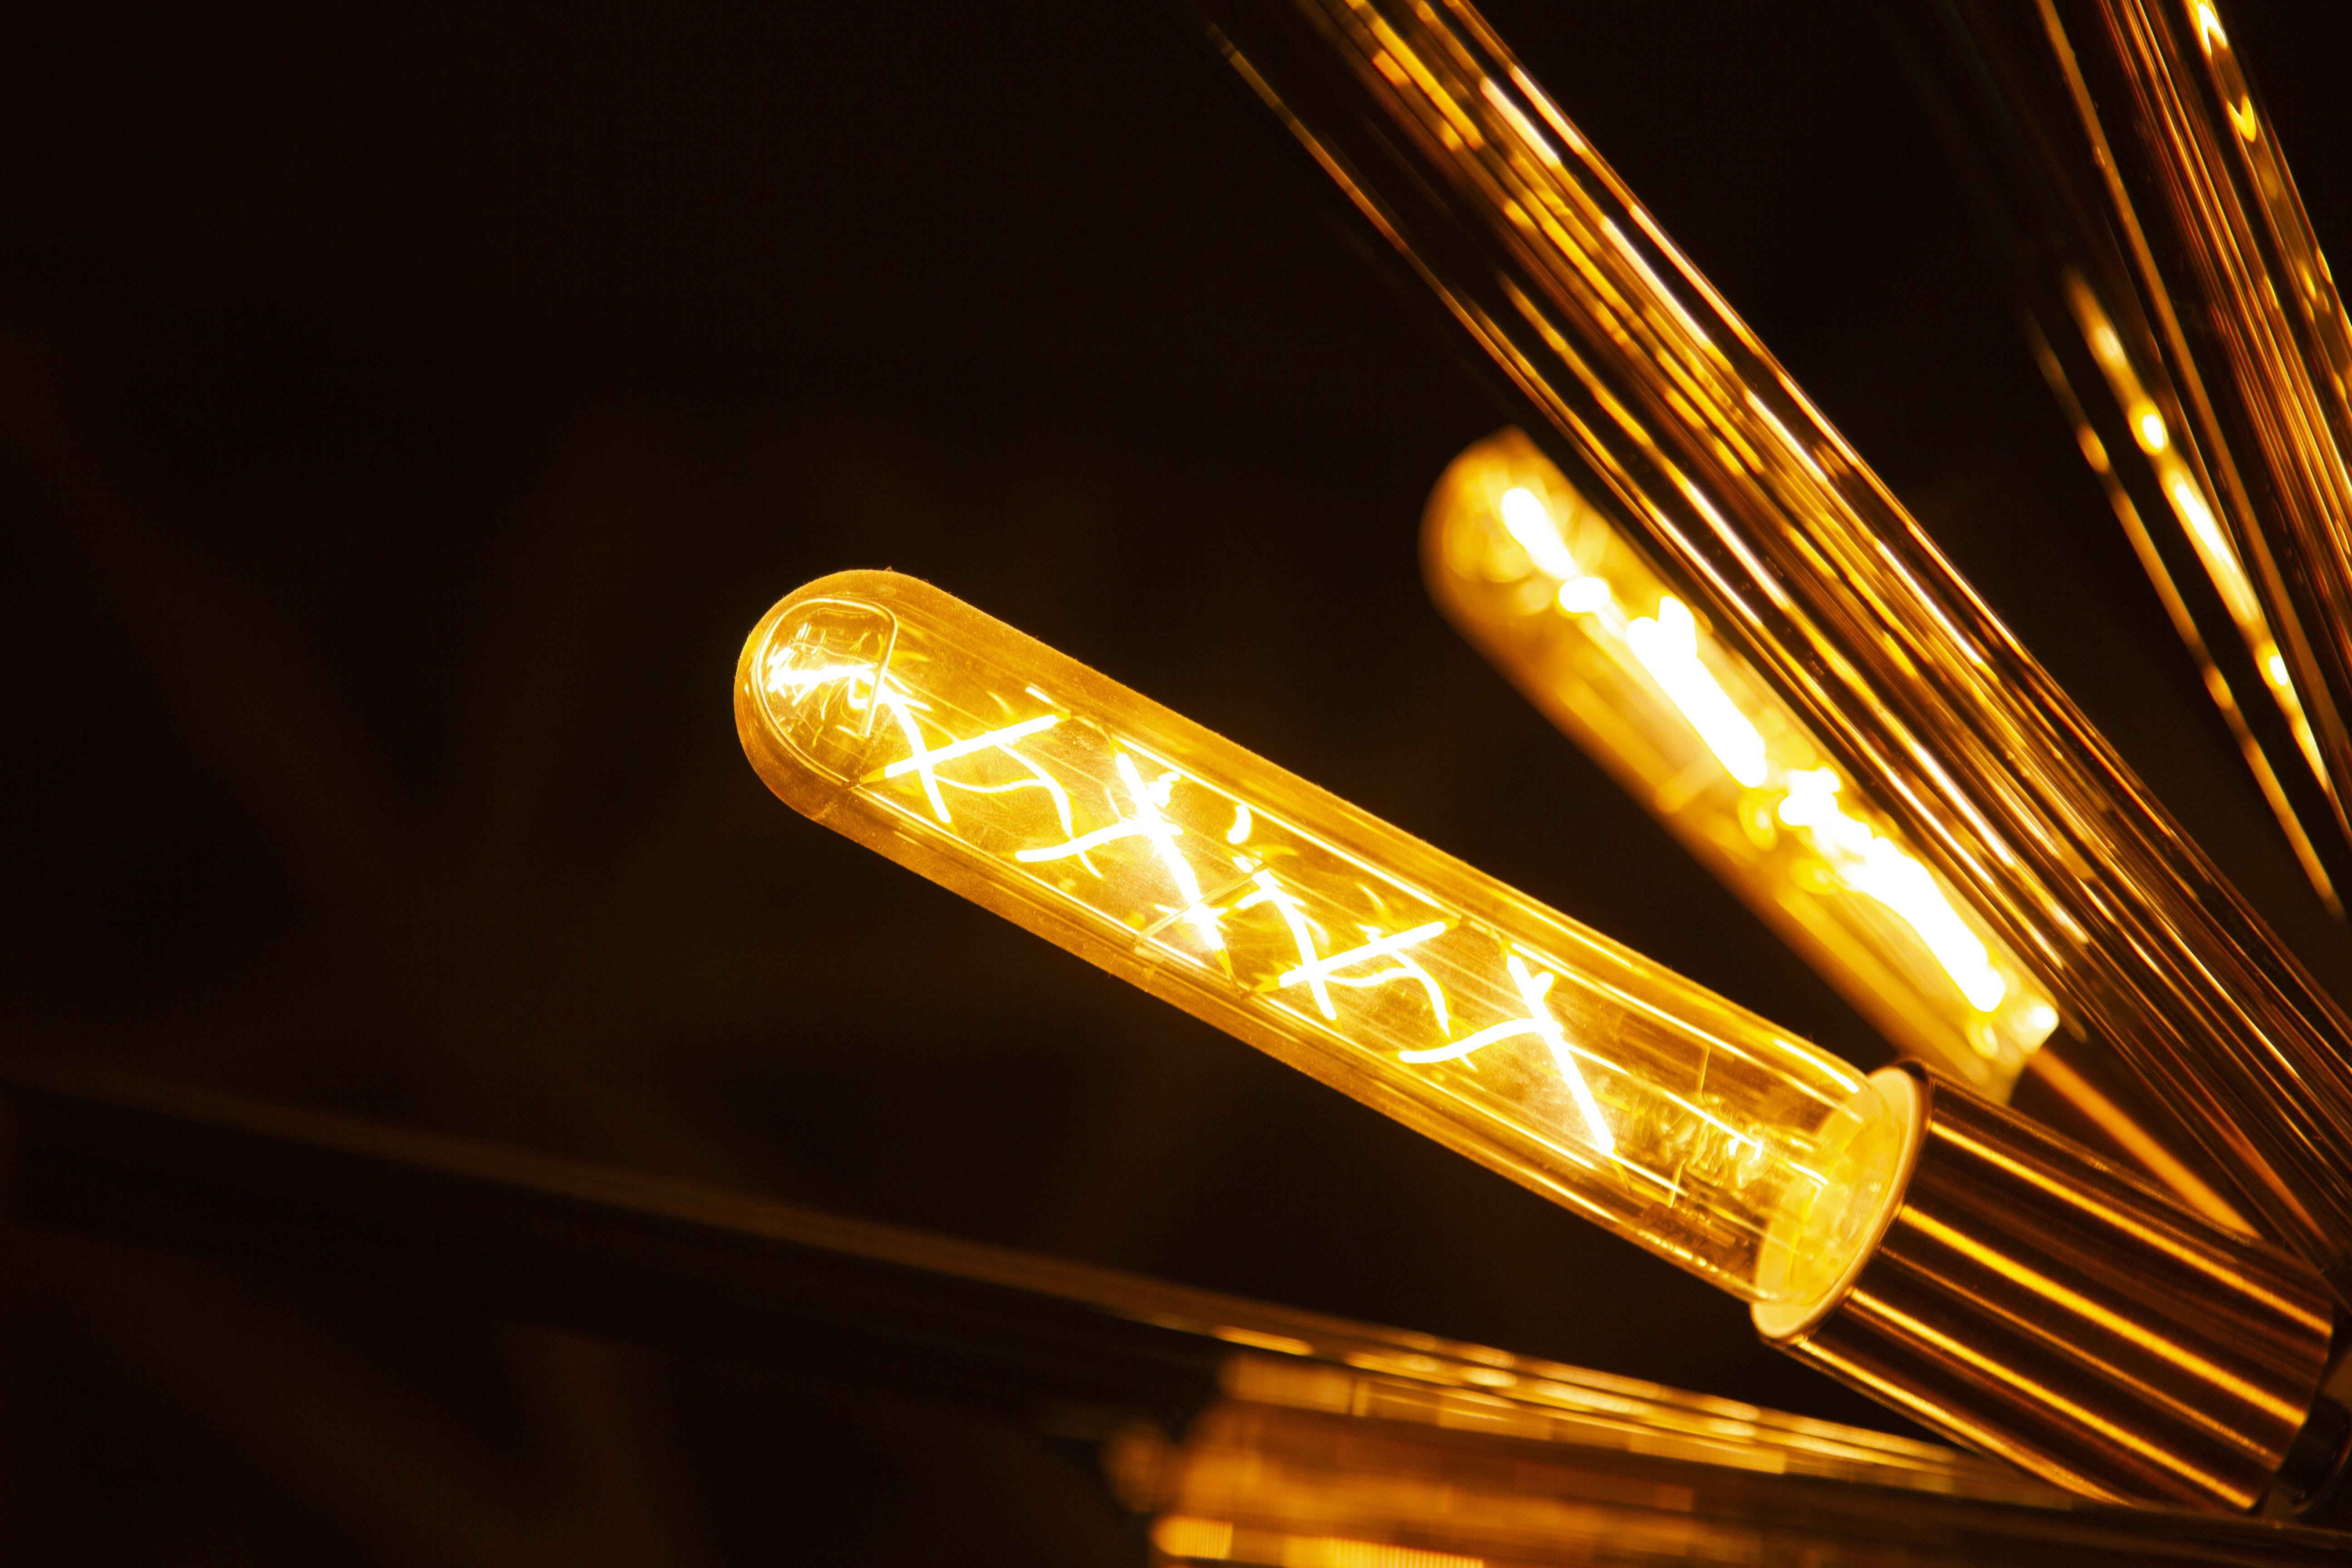 Free stock photo of Amarillo, iluminacion, lampara, luz